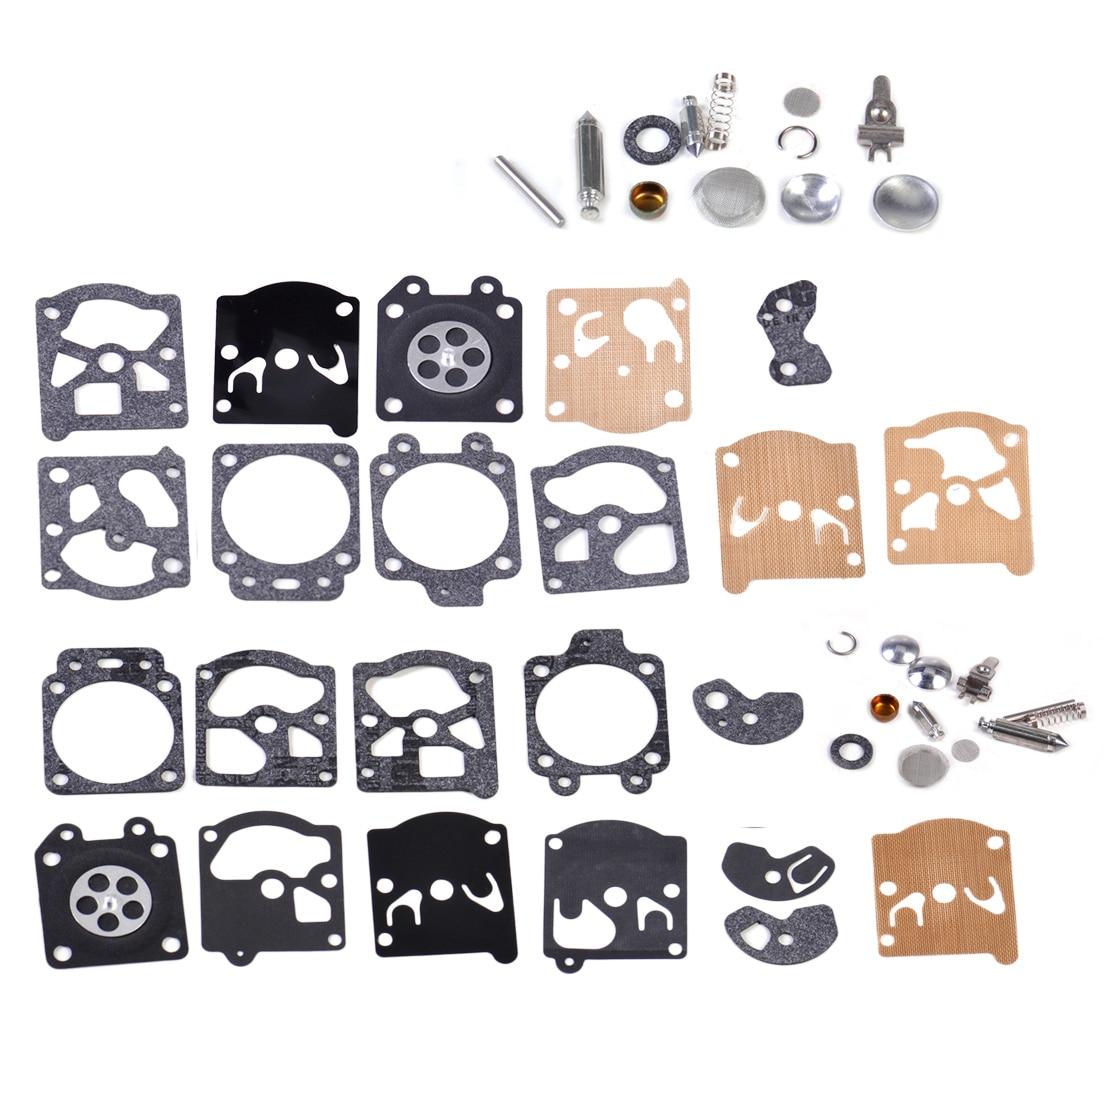 LETAOSK New Carburetor Rebuild kit Carb Gasket Diaphragm Repair fit for Walbro K10-WAT K20-WAT WA WT Series 2017 new arrival carburetor carb gasket diaphragm replacement kit fit chainsaw for rb 39 c1q serise